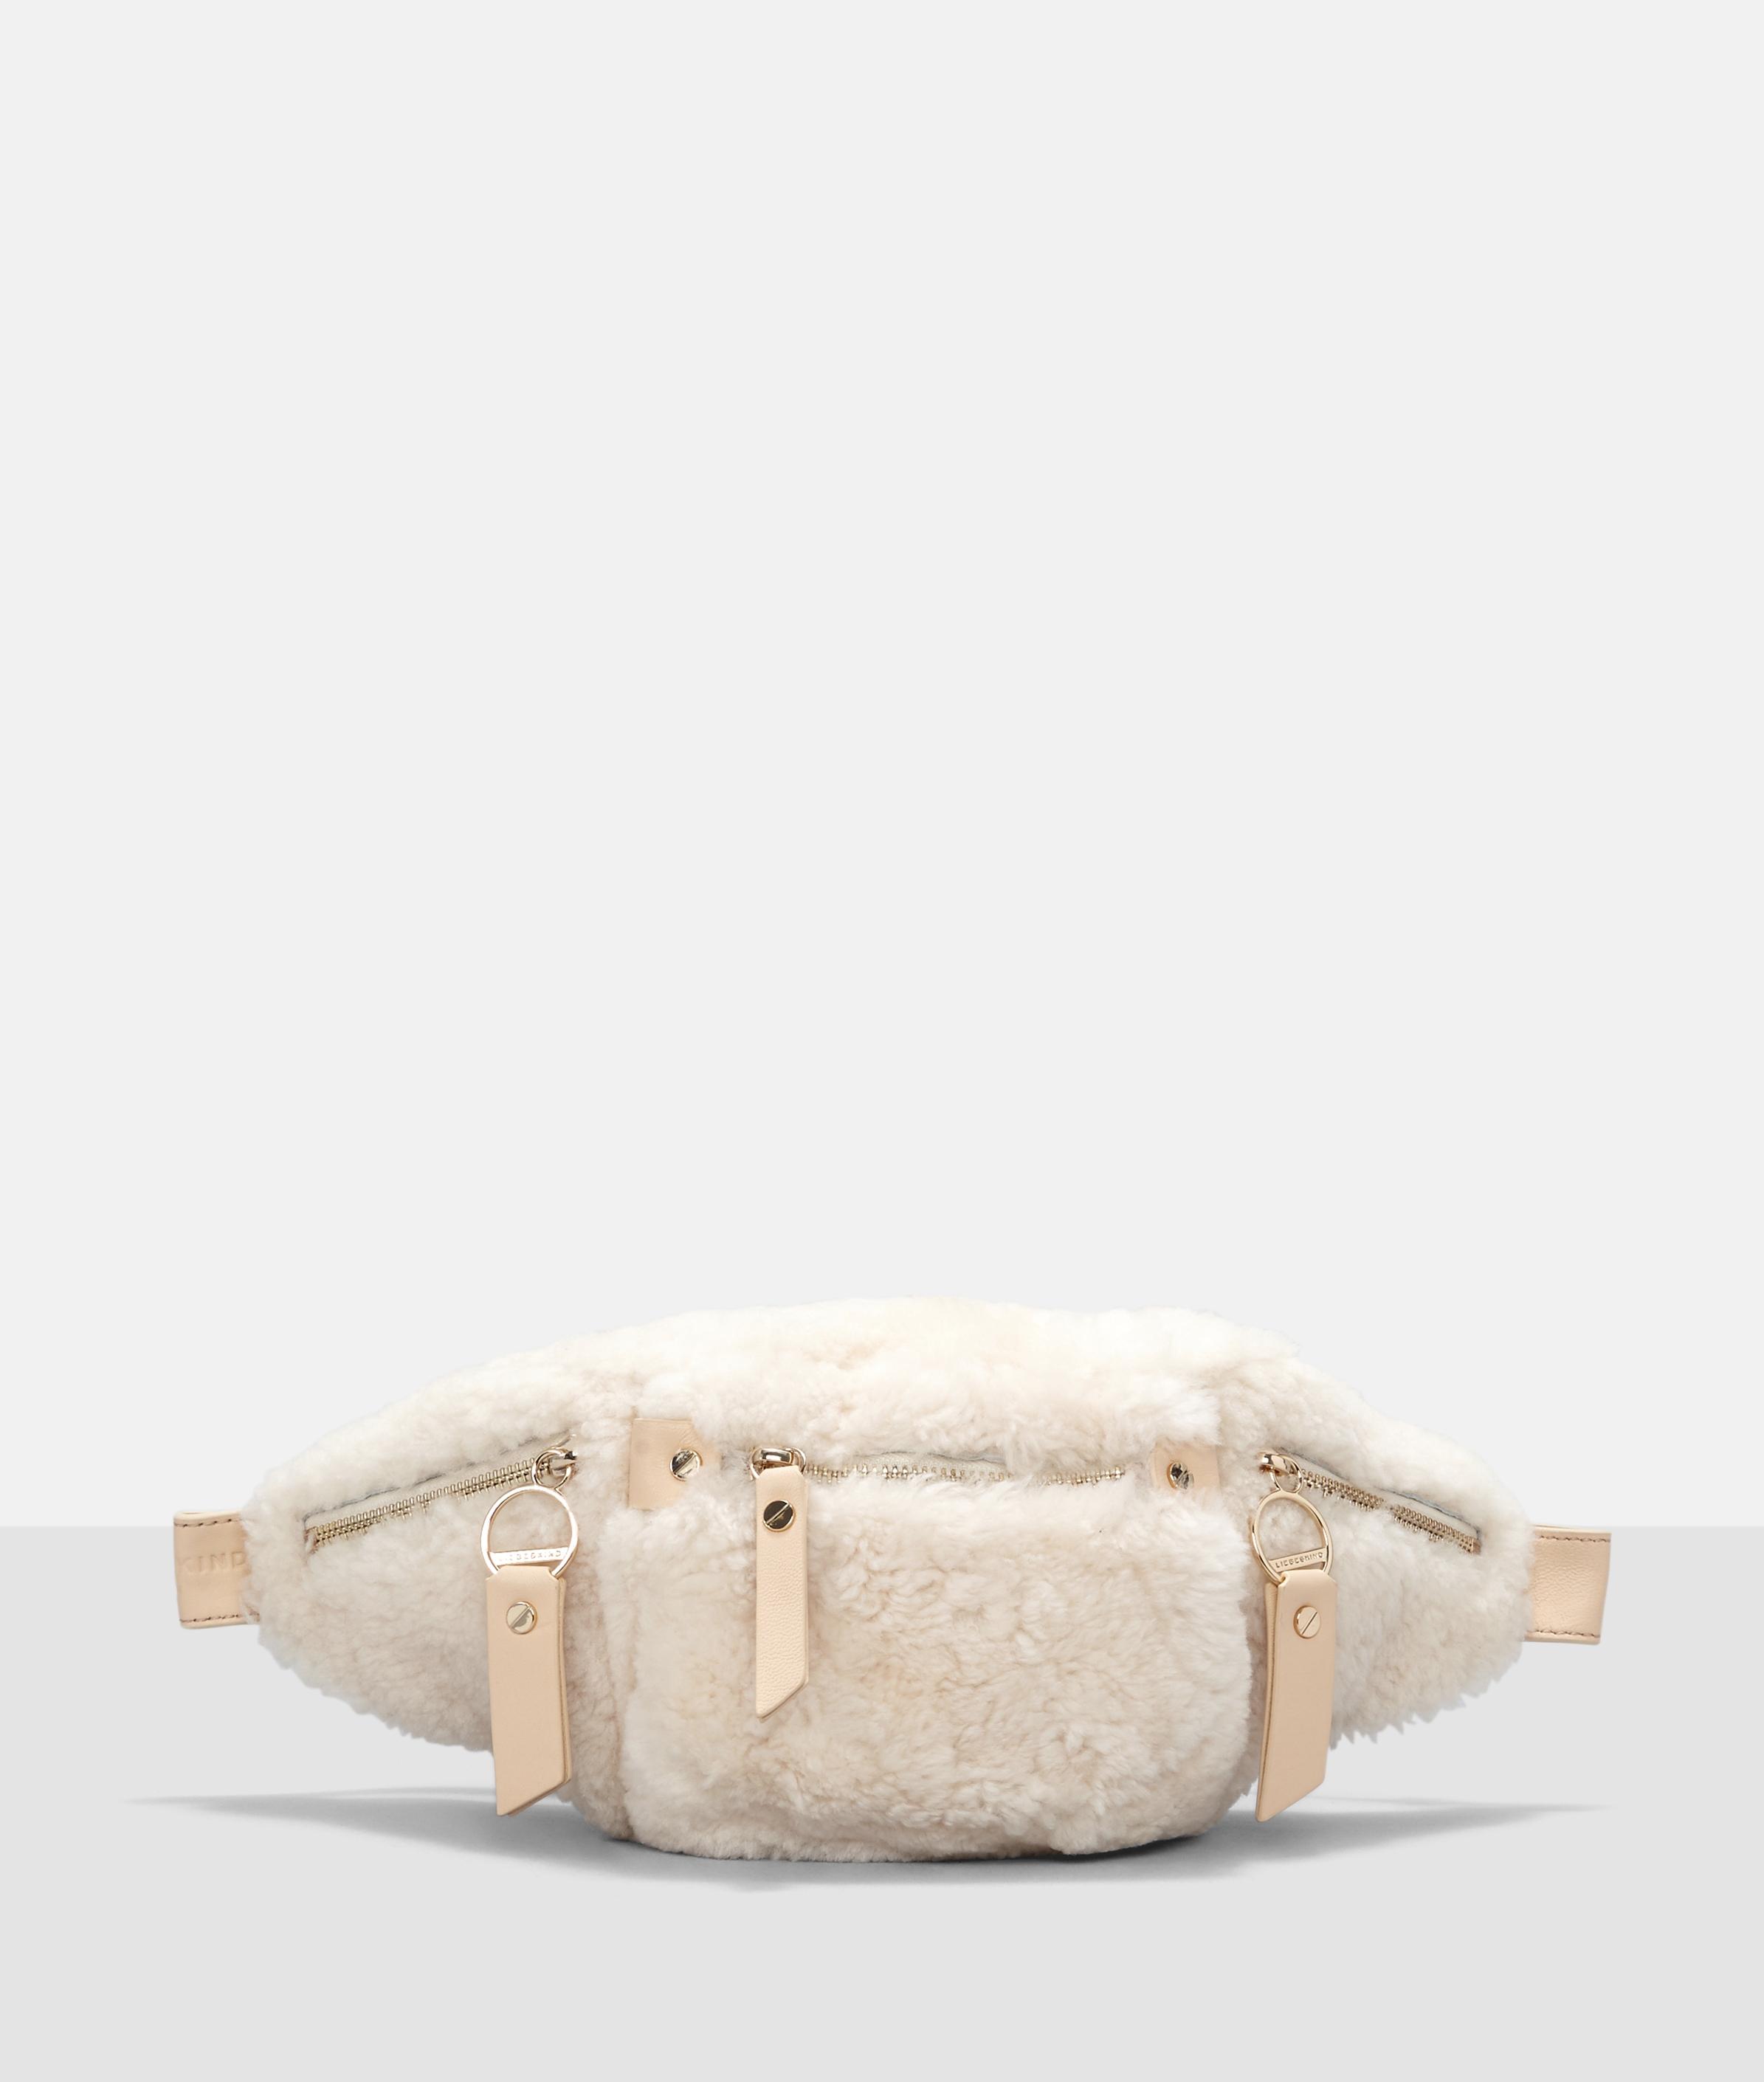 liebeskind berlin - Tasche Fanny Pack Belt Bag, Braun